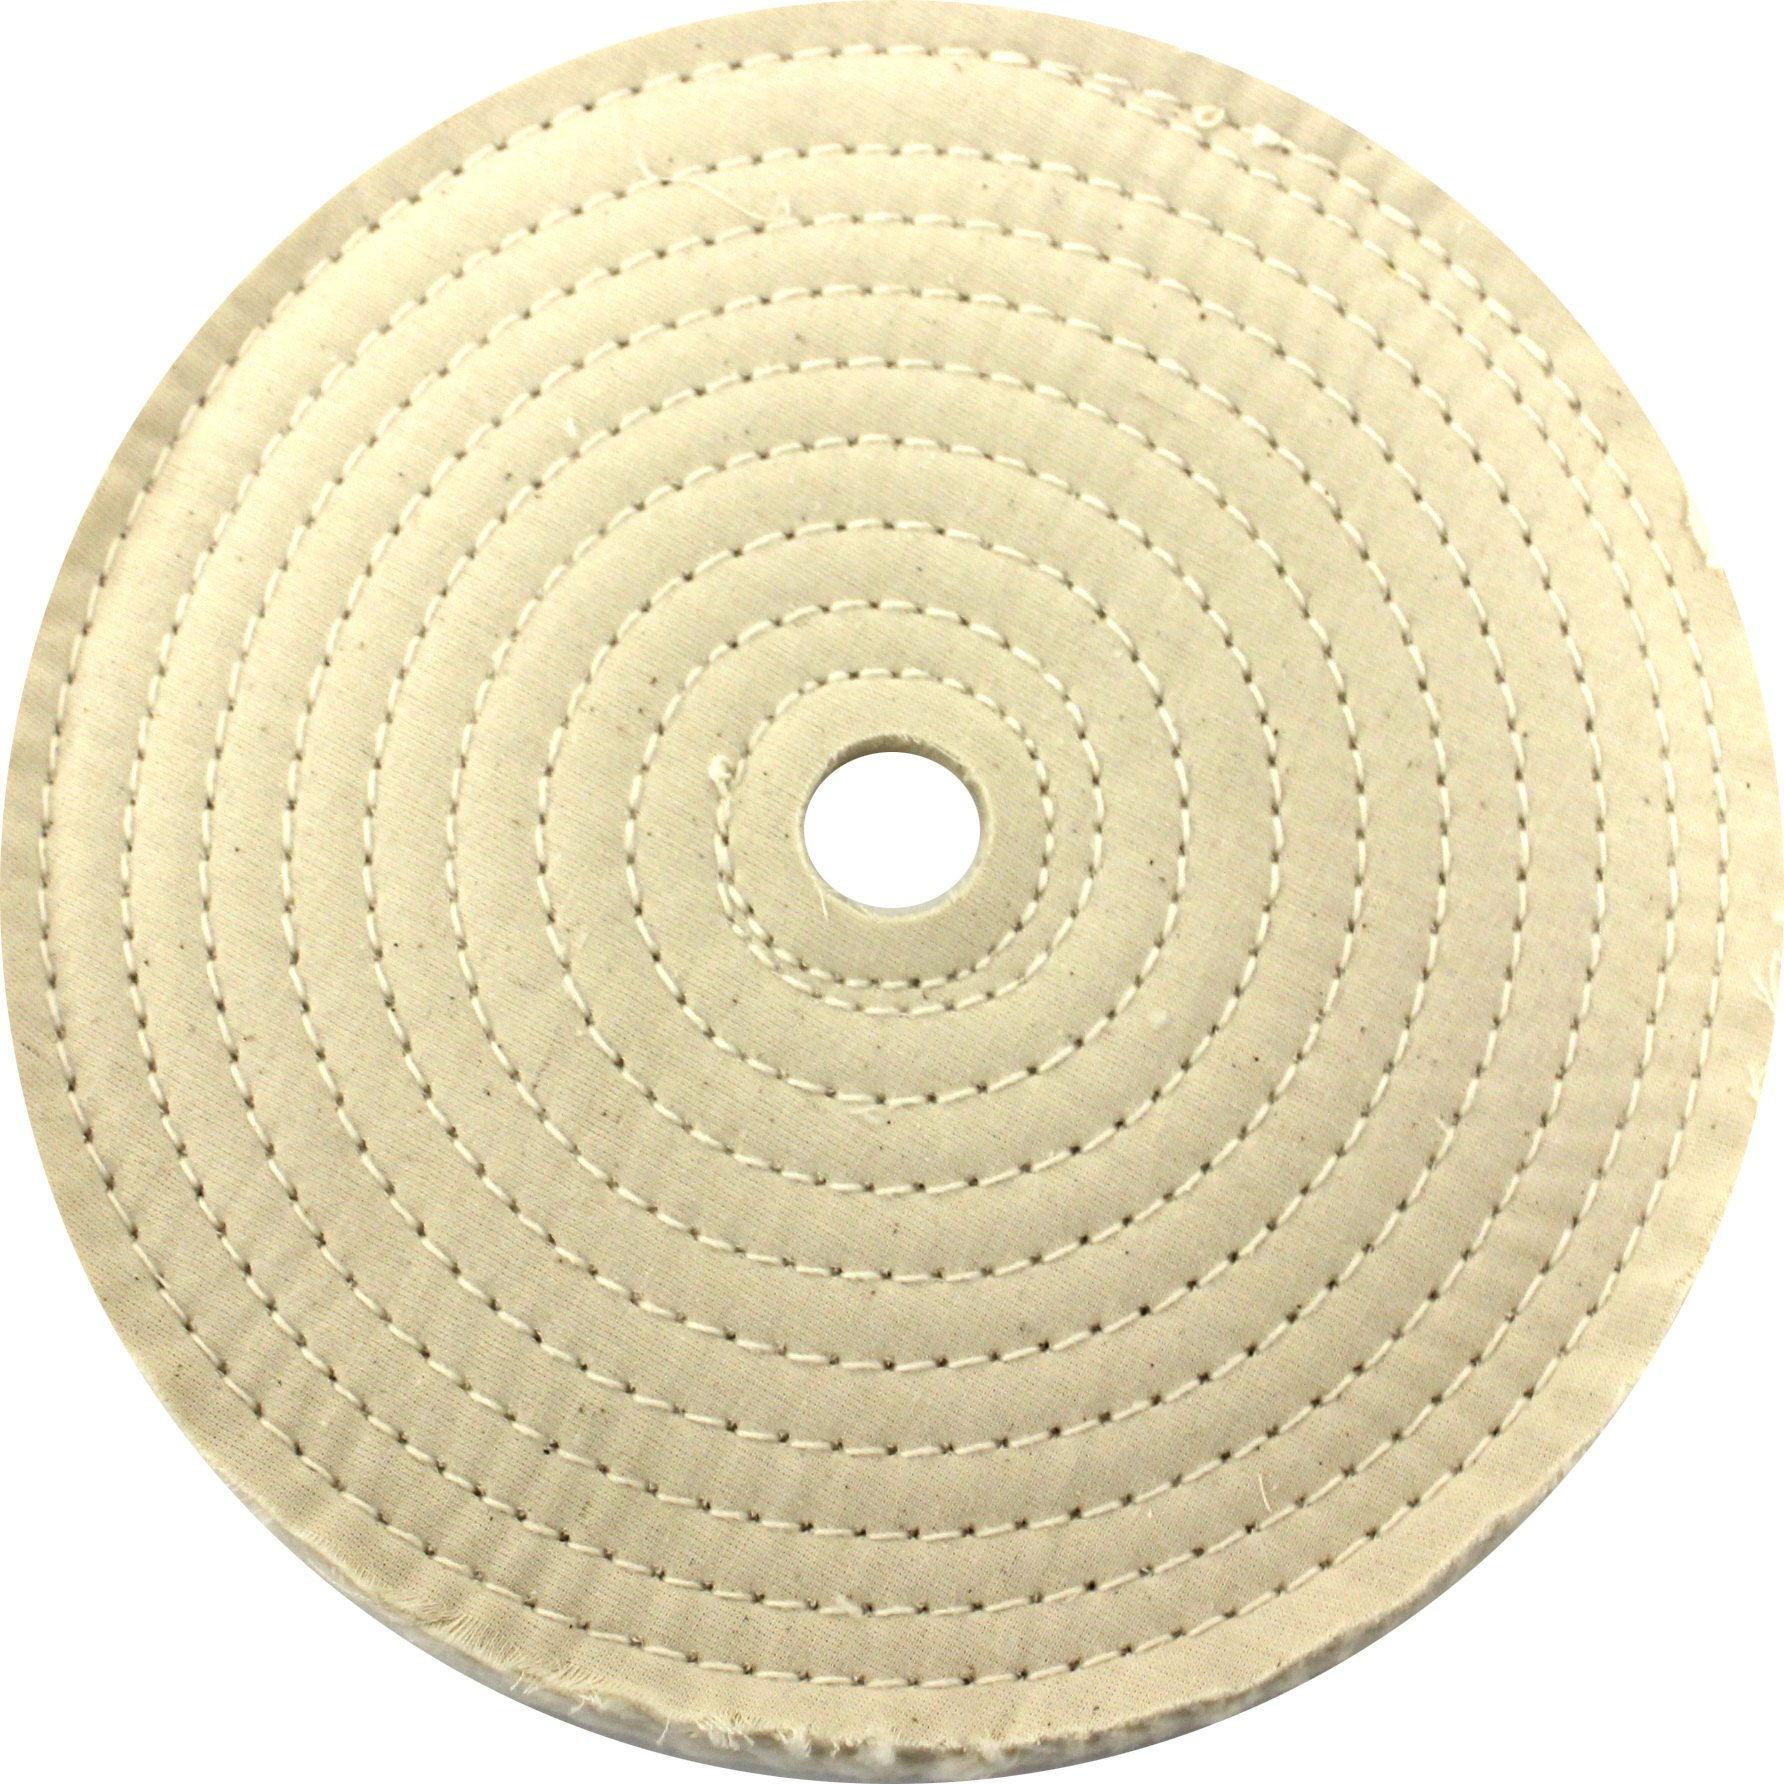 JacksonLea 47402SP Sewn Conventional Buff, 30 Ply BR 60/60 Cotton Cloth, 8'' Diameter, 1'' Arbor Hole